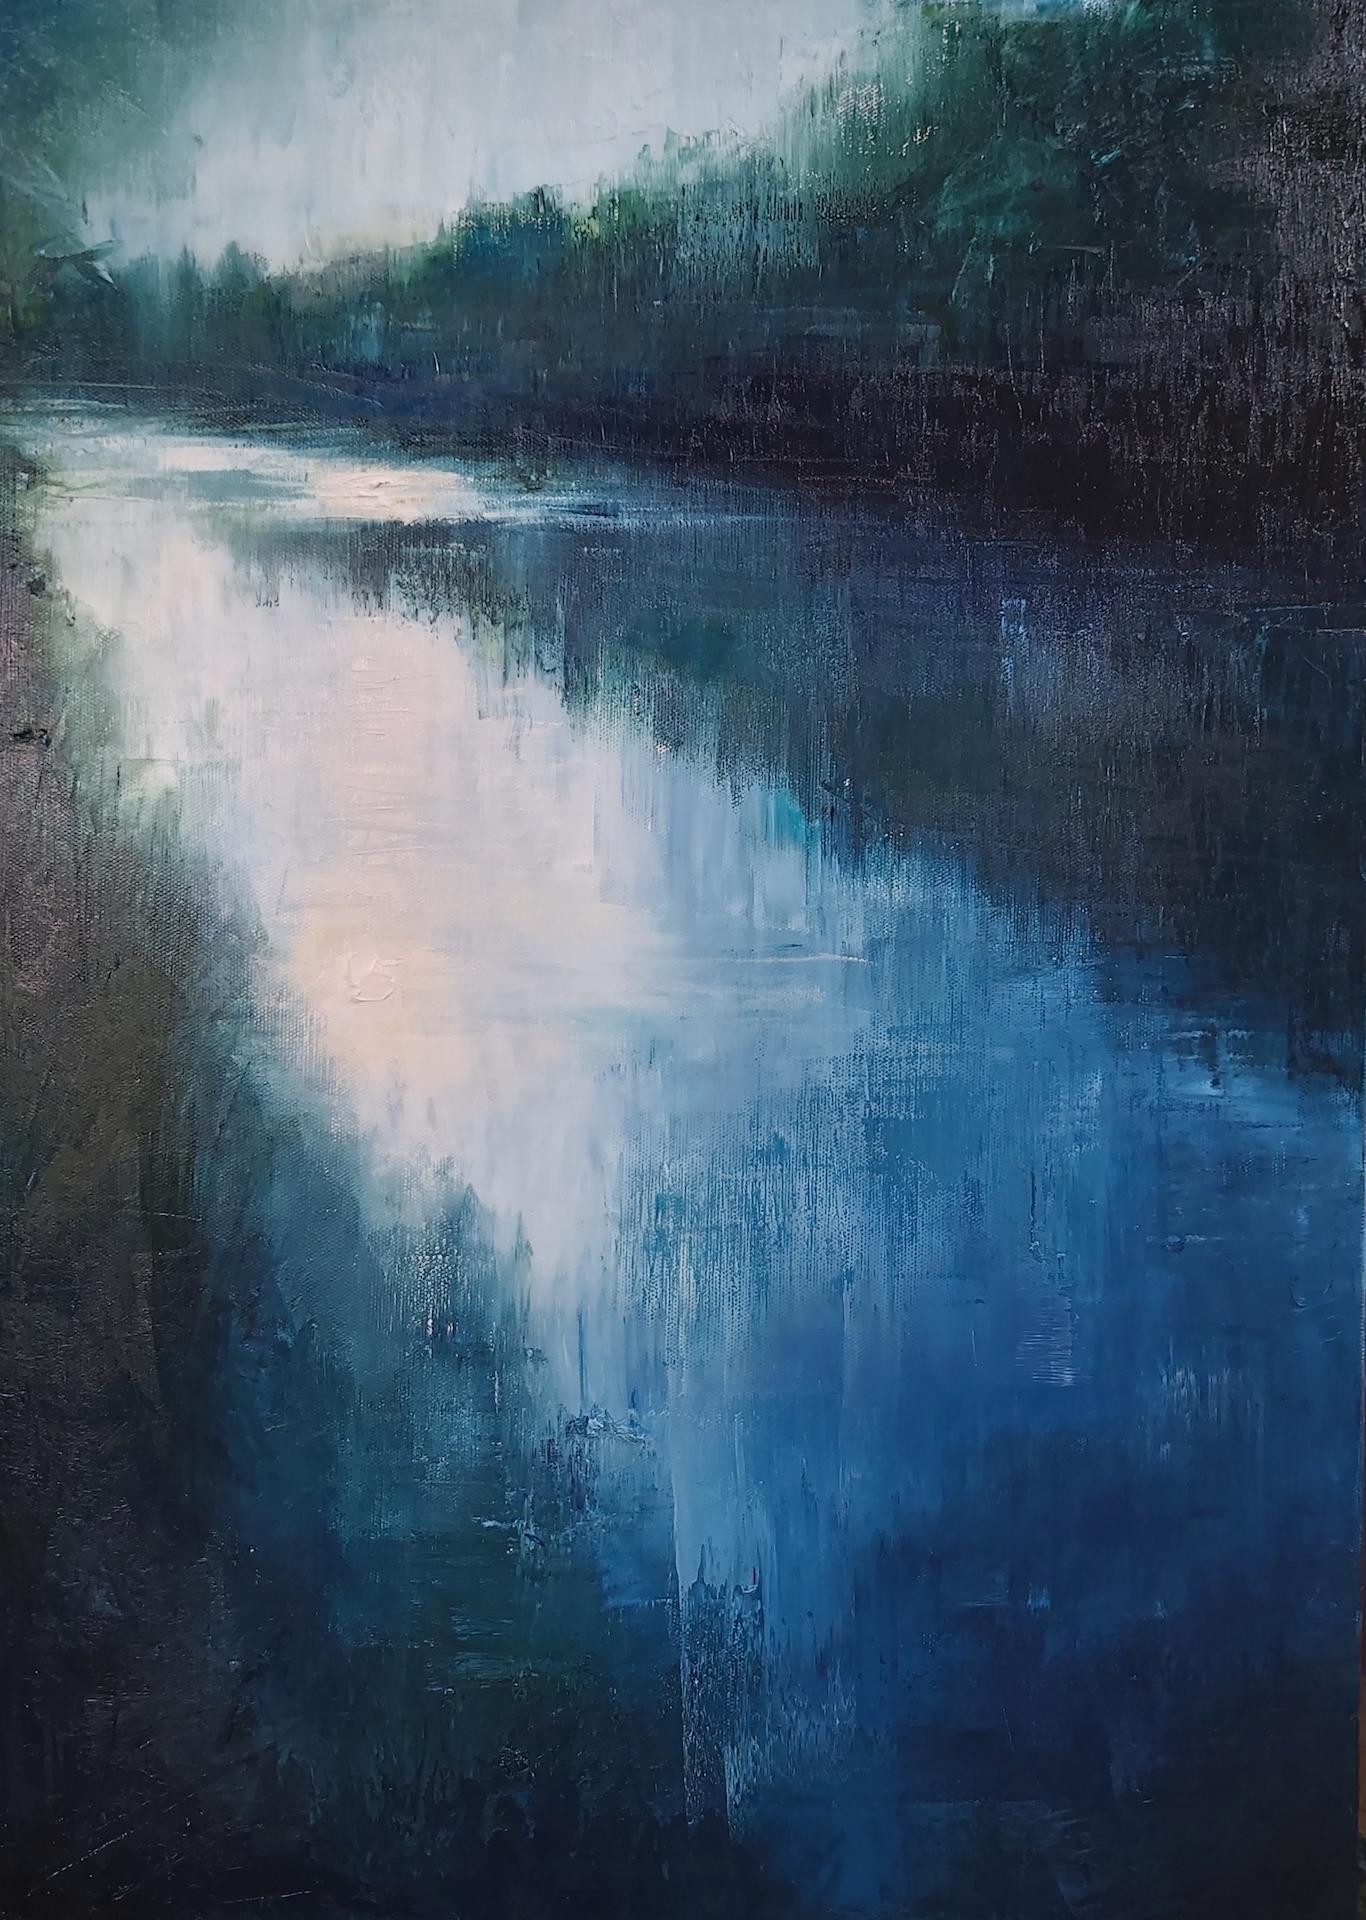 The River. 50/70cm. Oil on Linen. 2020. Landscape painting Norfolk Broads